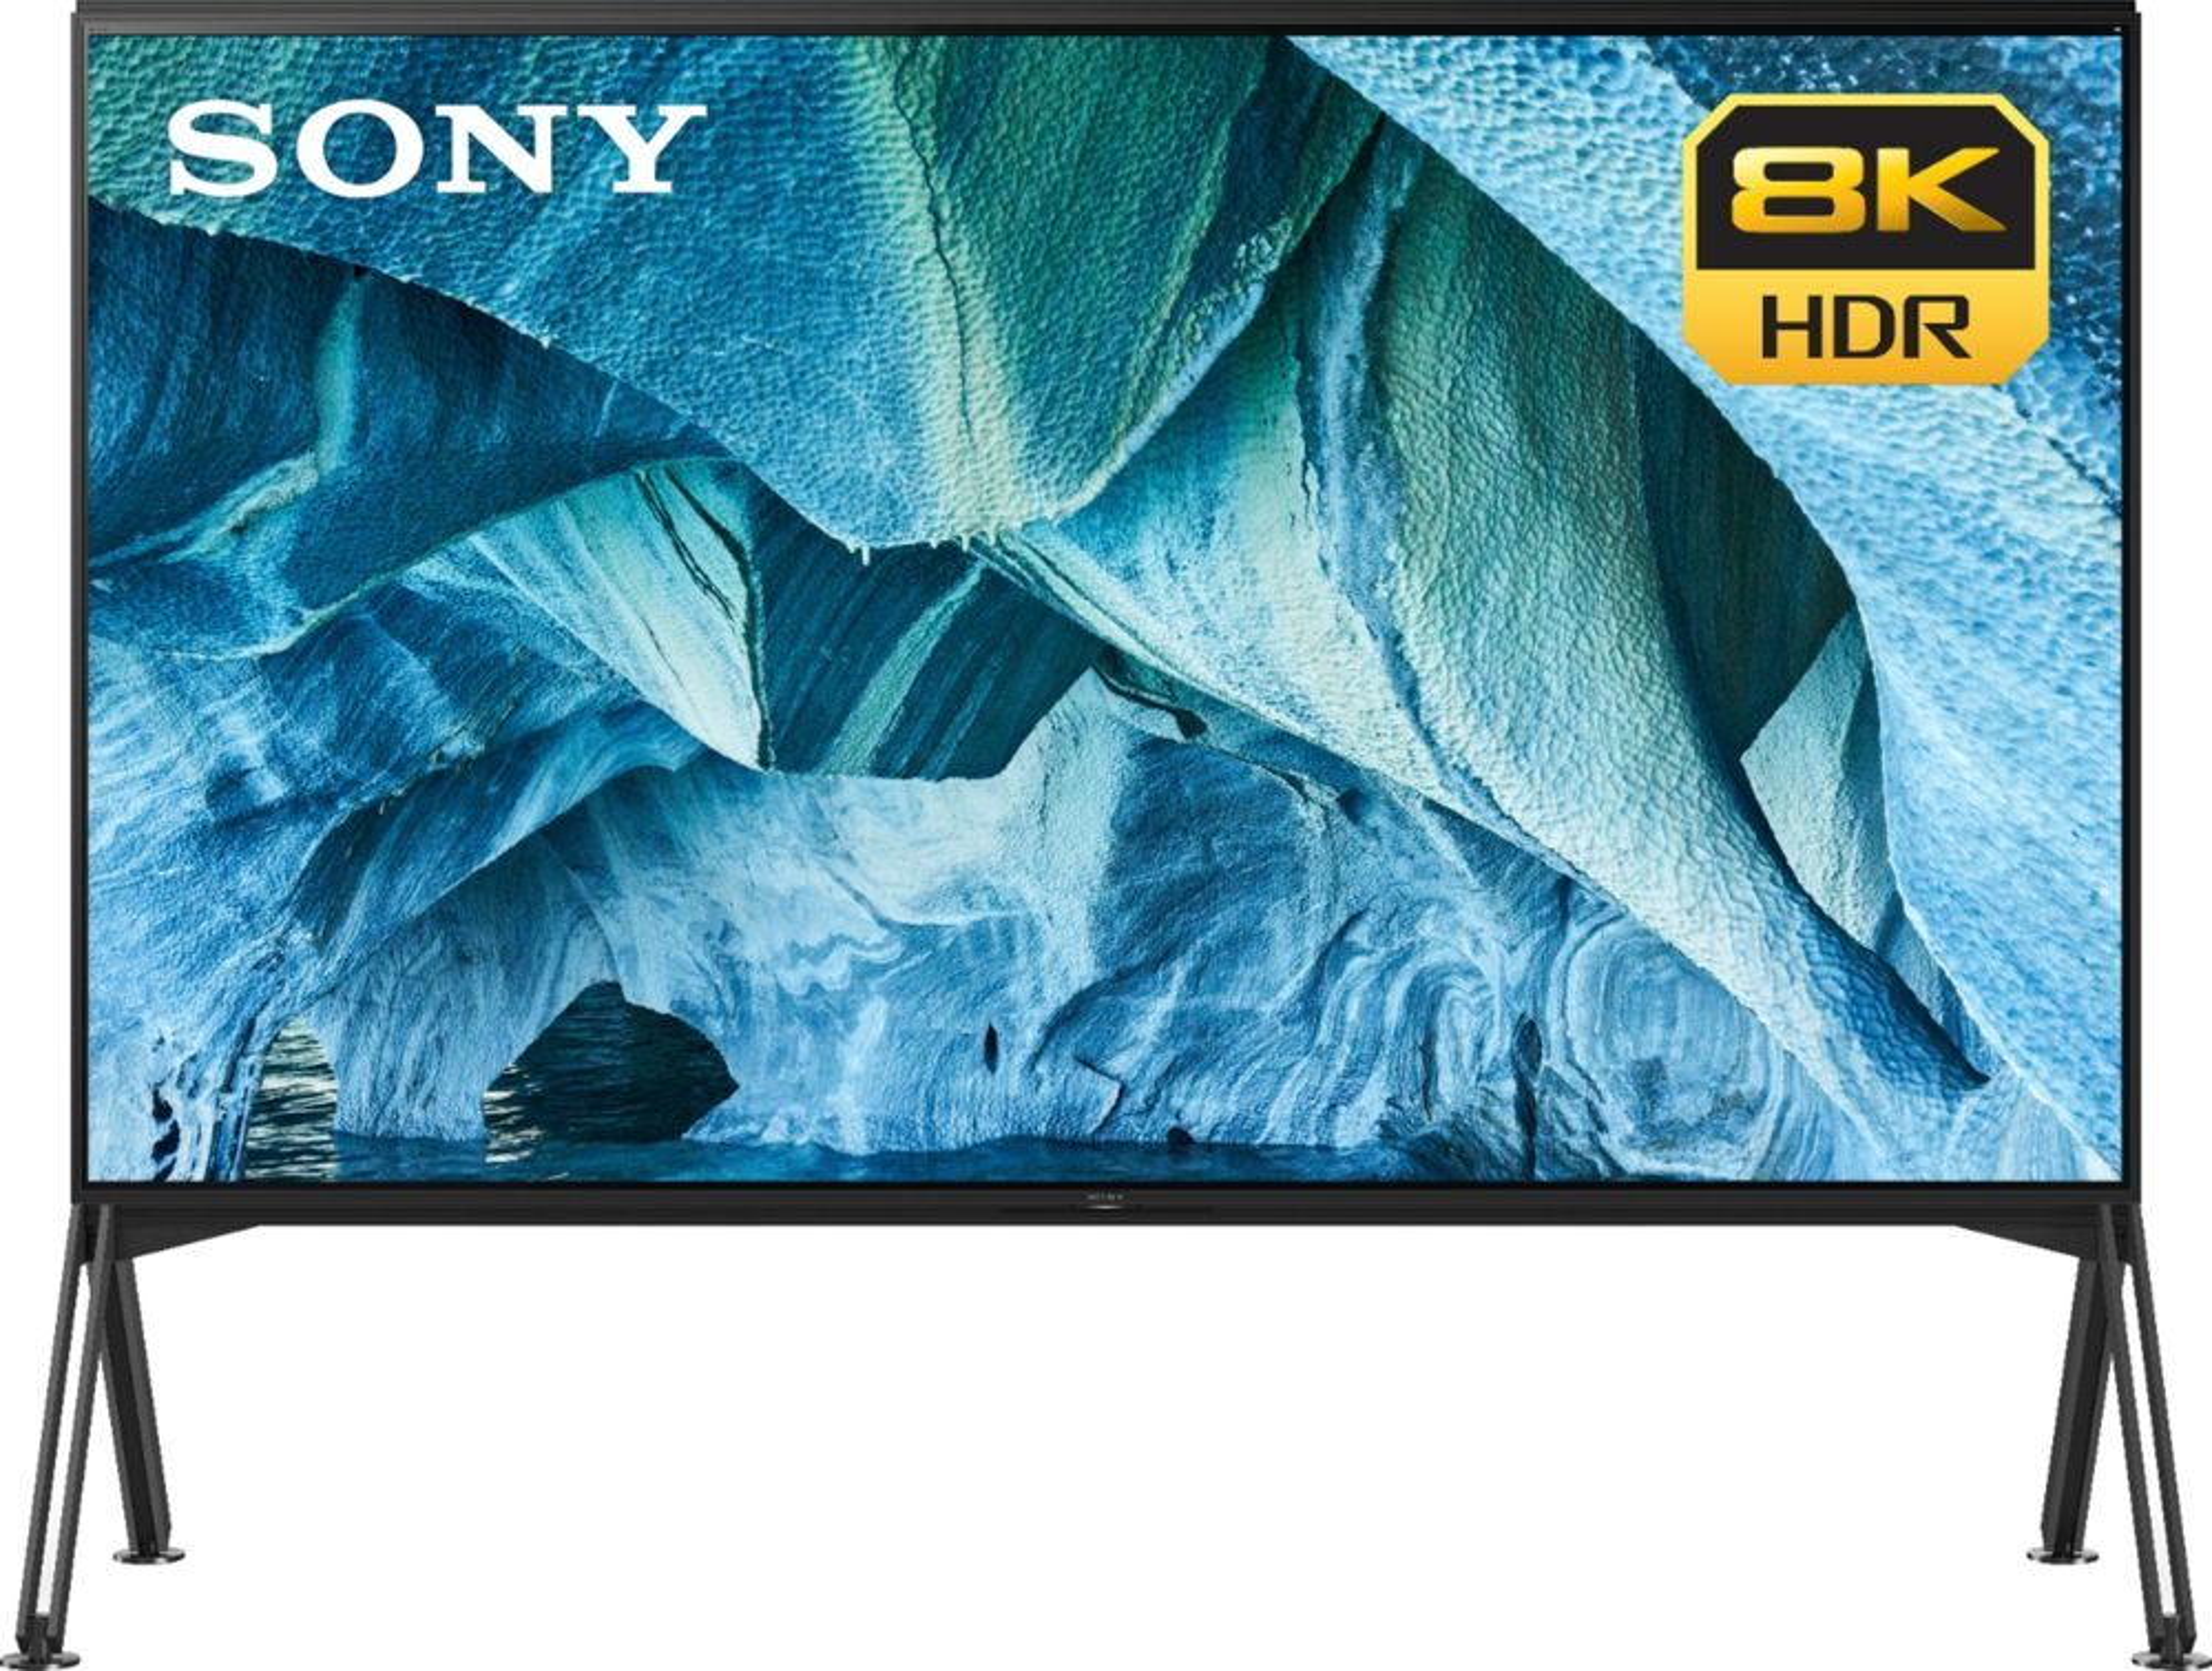 Sony XBR98Z9G largeFrontImage